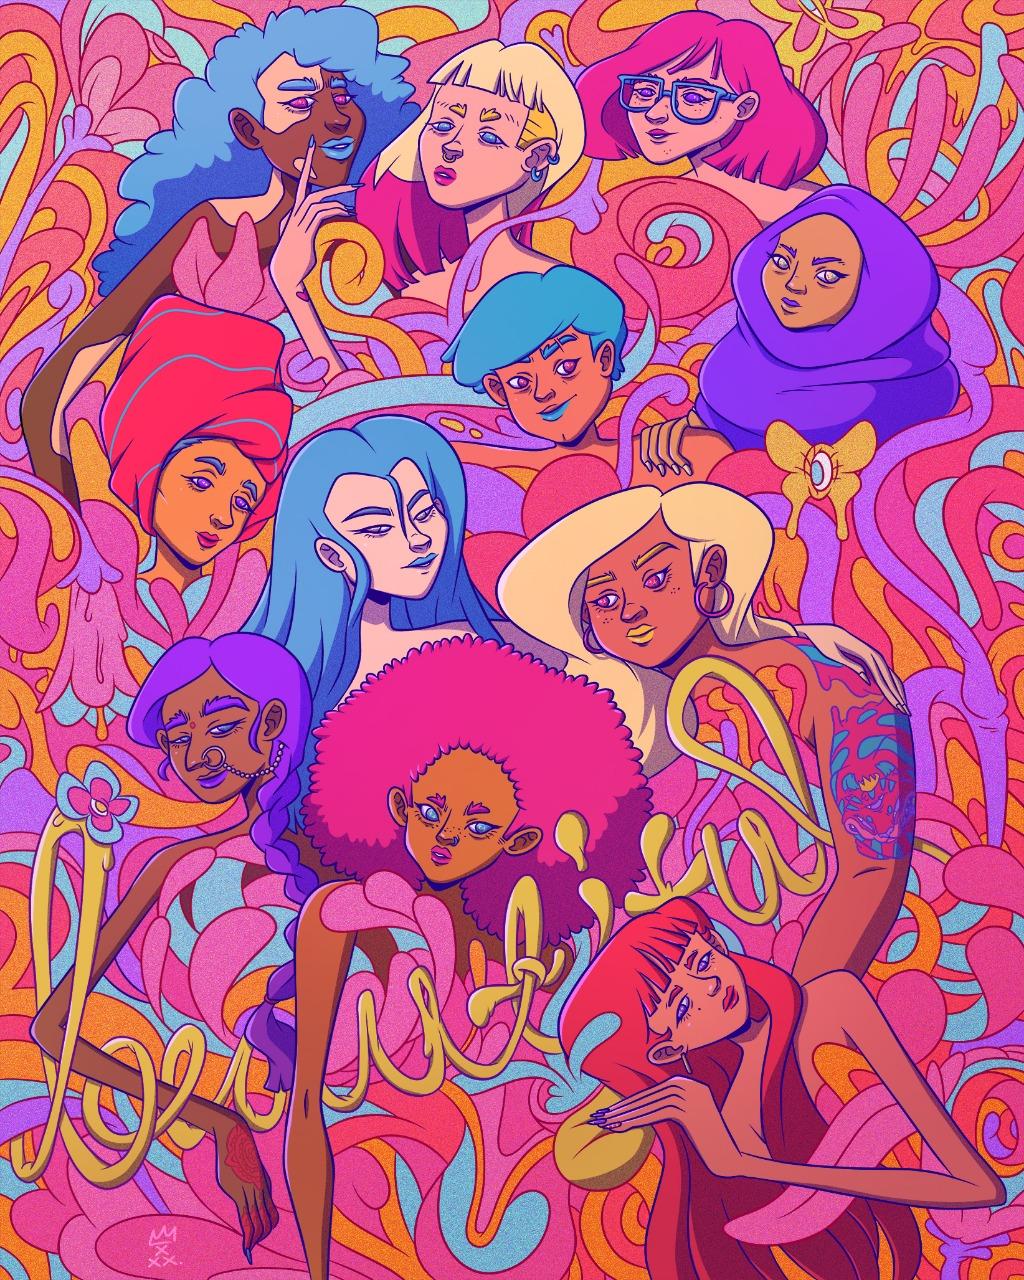 GirlsclubAsia-Artist-Shane Tiara-4